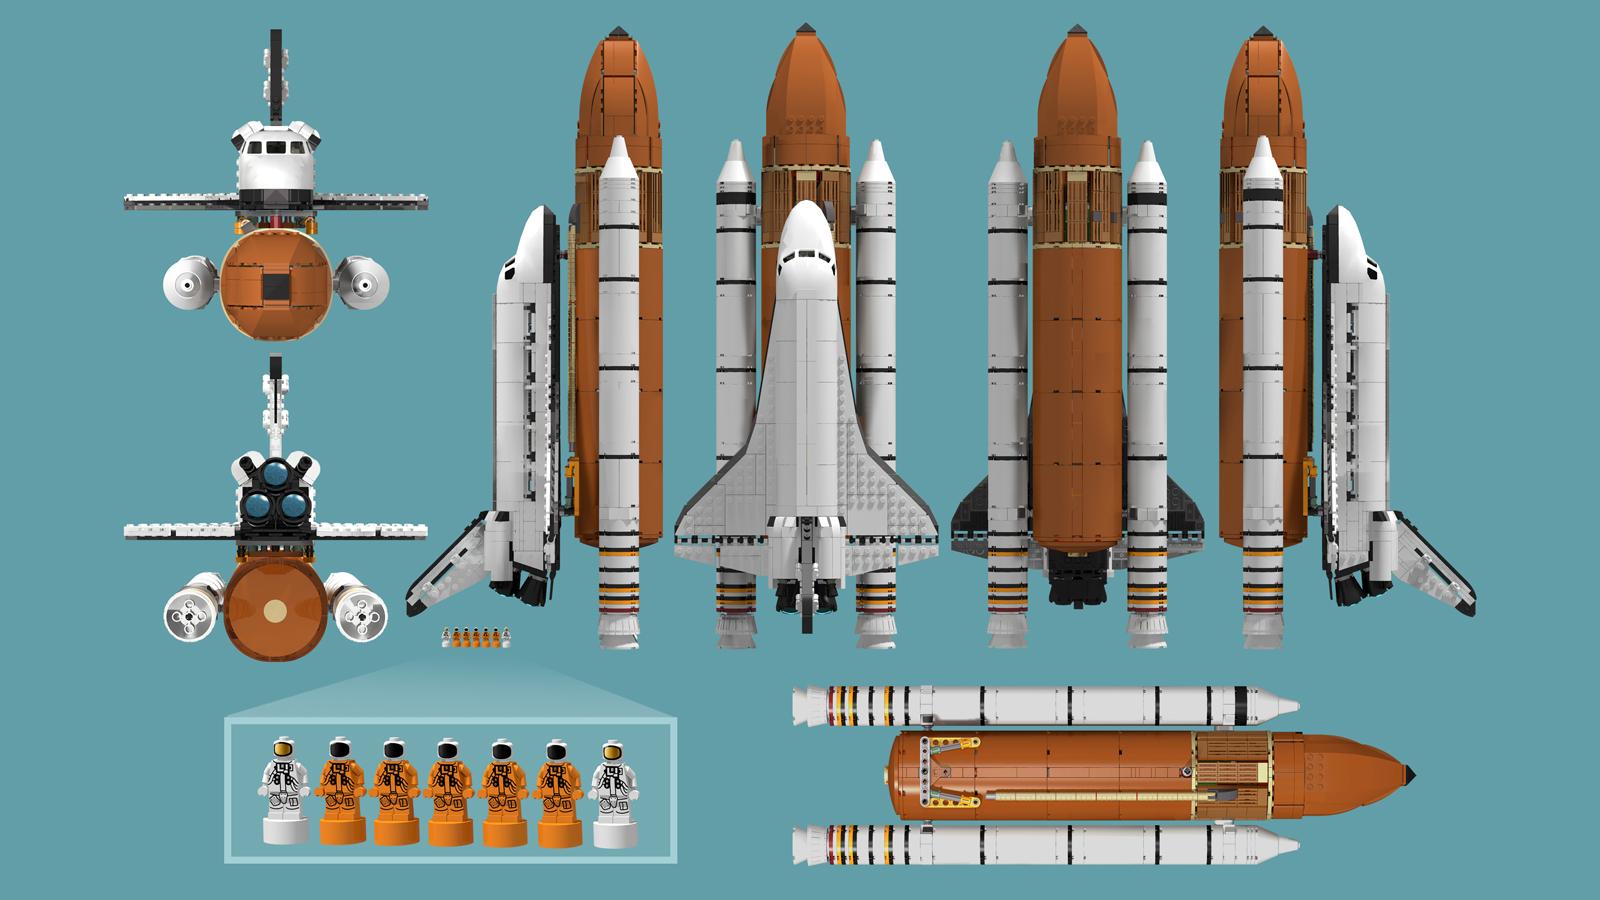 lego space shuttle orbiter - photo #25